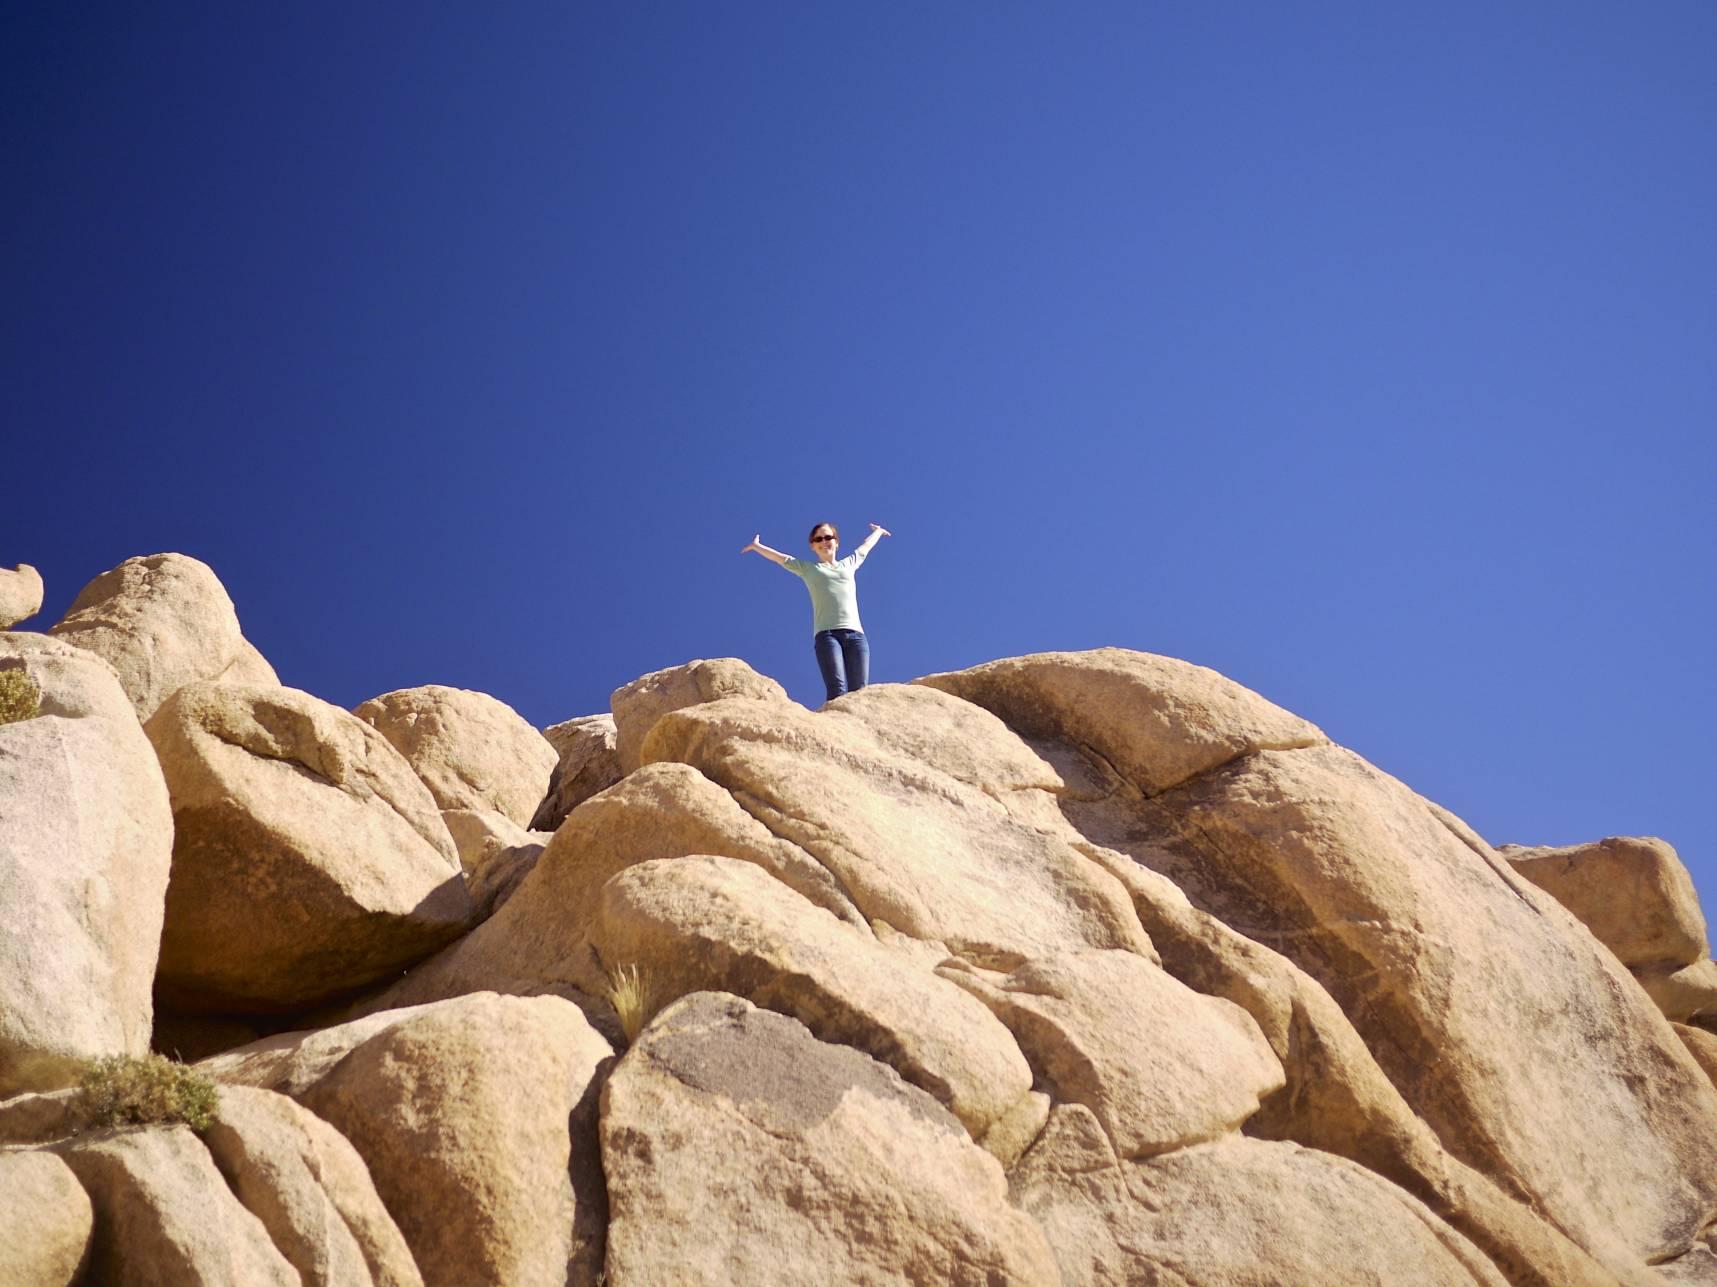 Heather, the Rock Climber #1.jpg